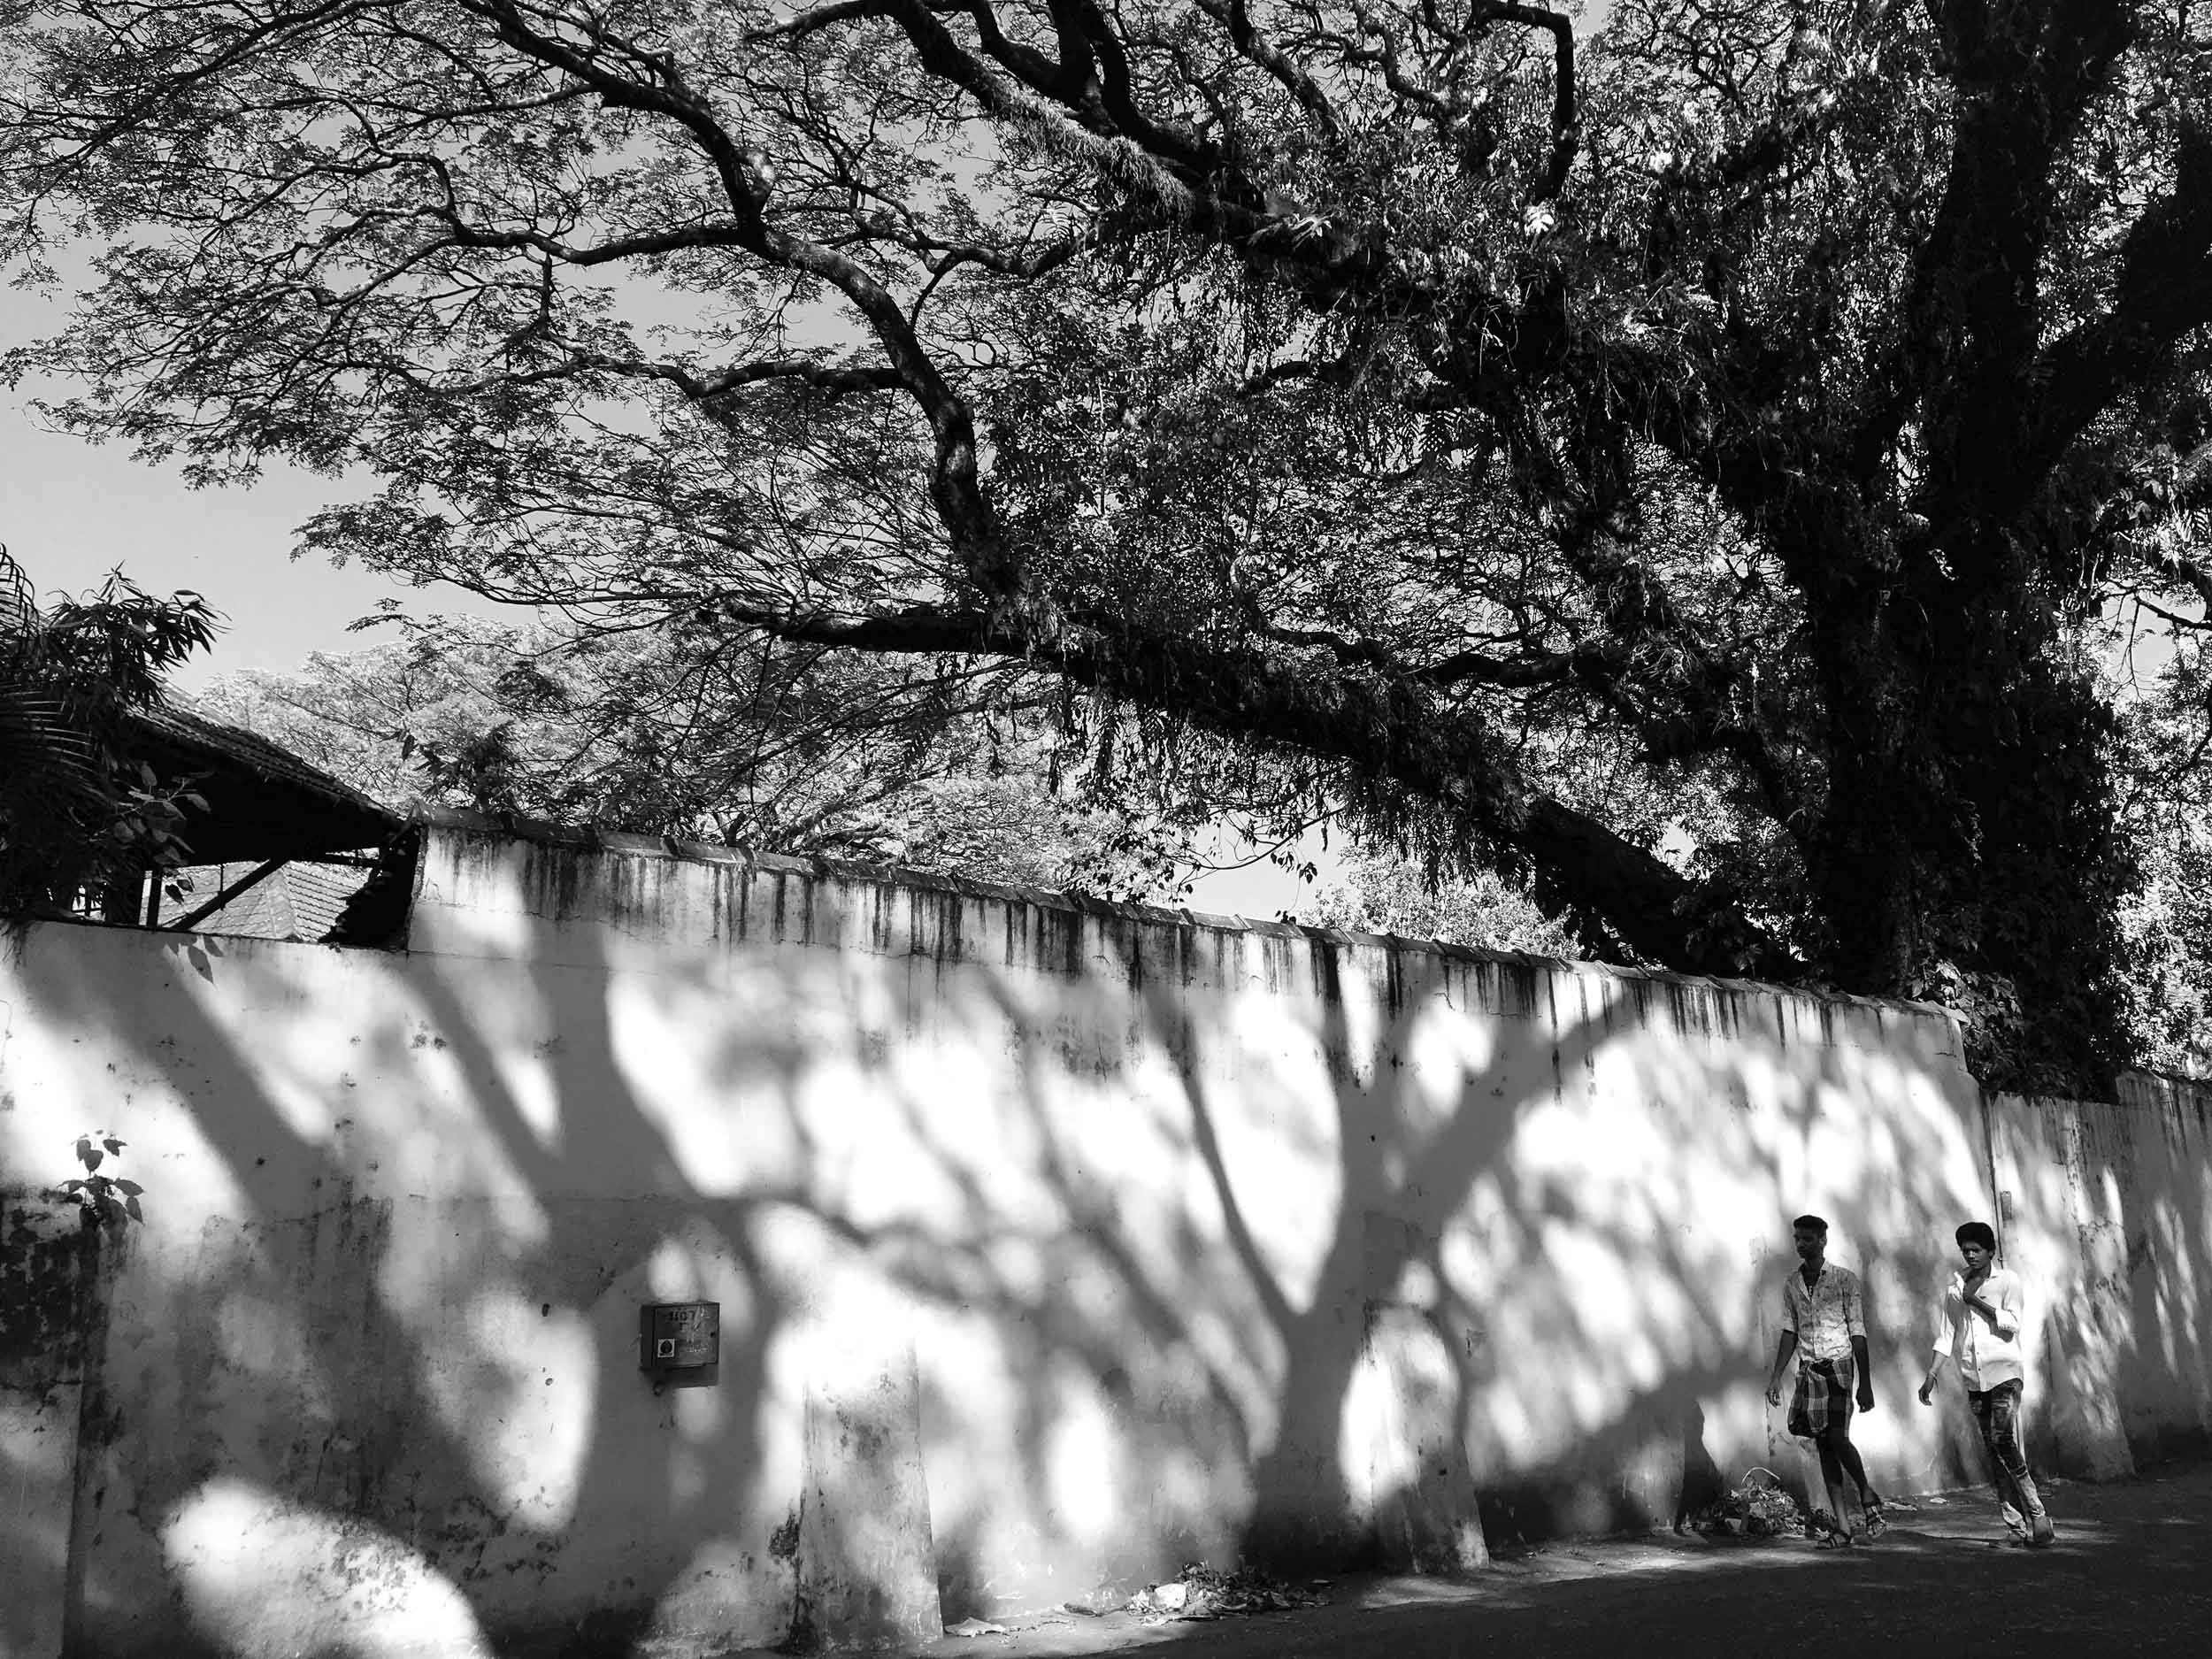 Sindhur_Photography_Kochi Muziris Biennale -2019-60-2.JPG